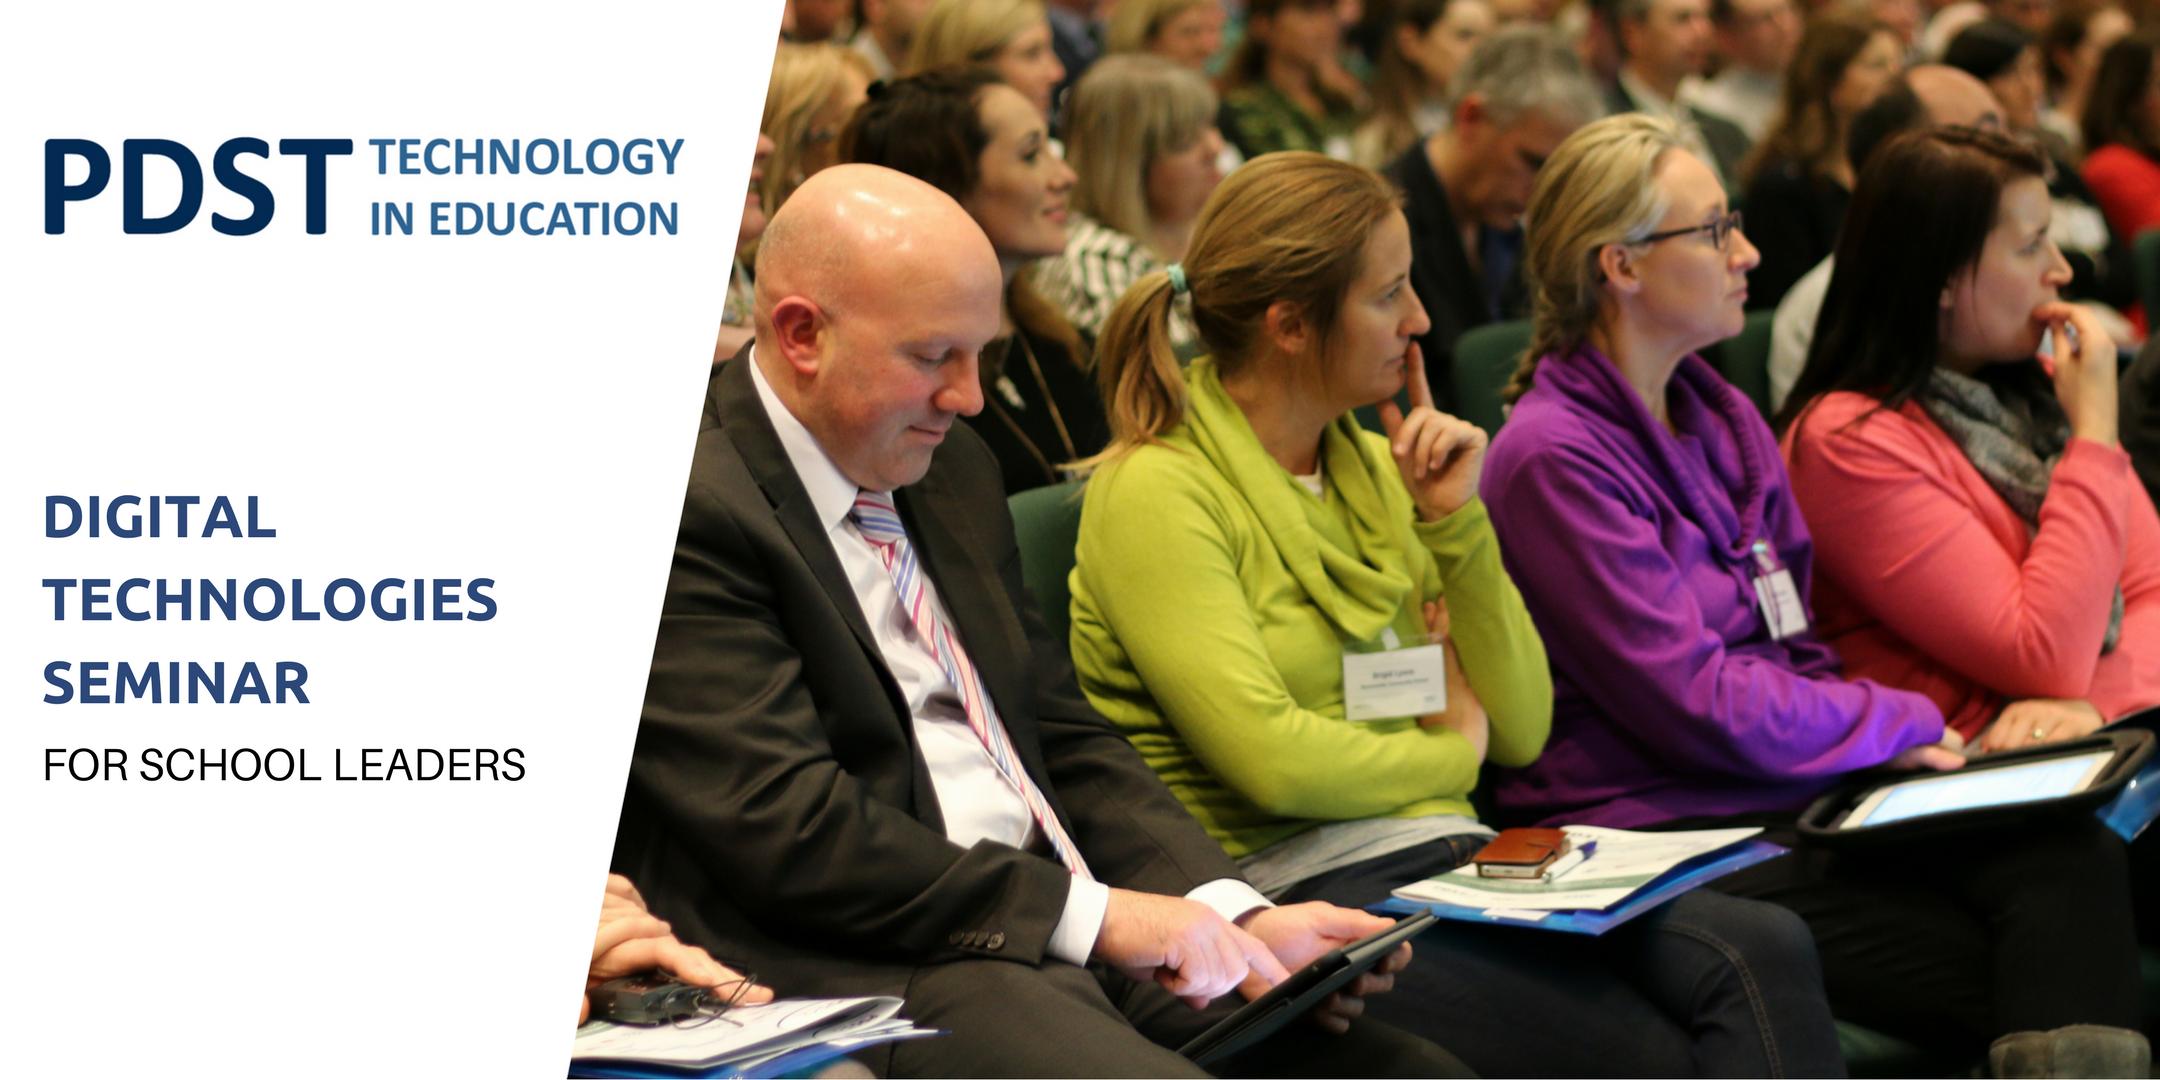 PDST Digital Technologies Seminar for School Leaders